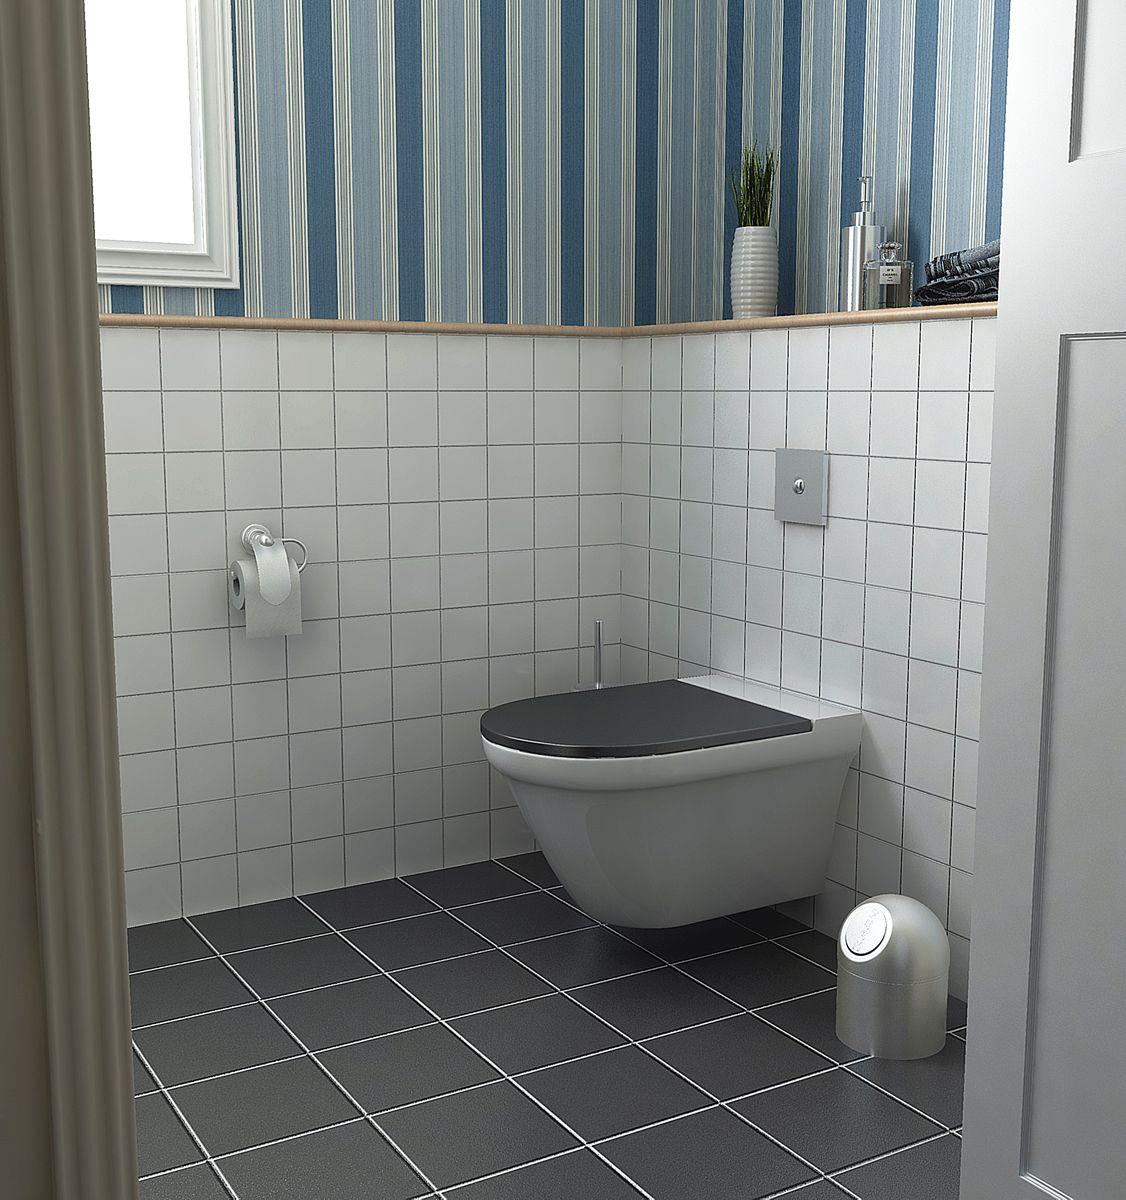 Bathroom Tile Inspiration Gallery Bathroom Design 2017 2018